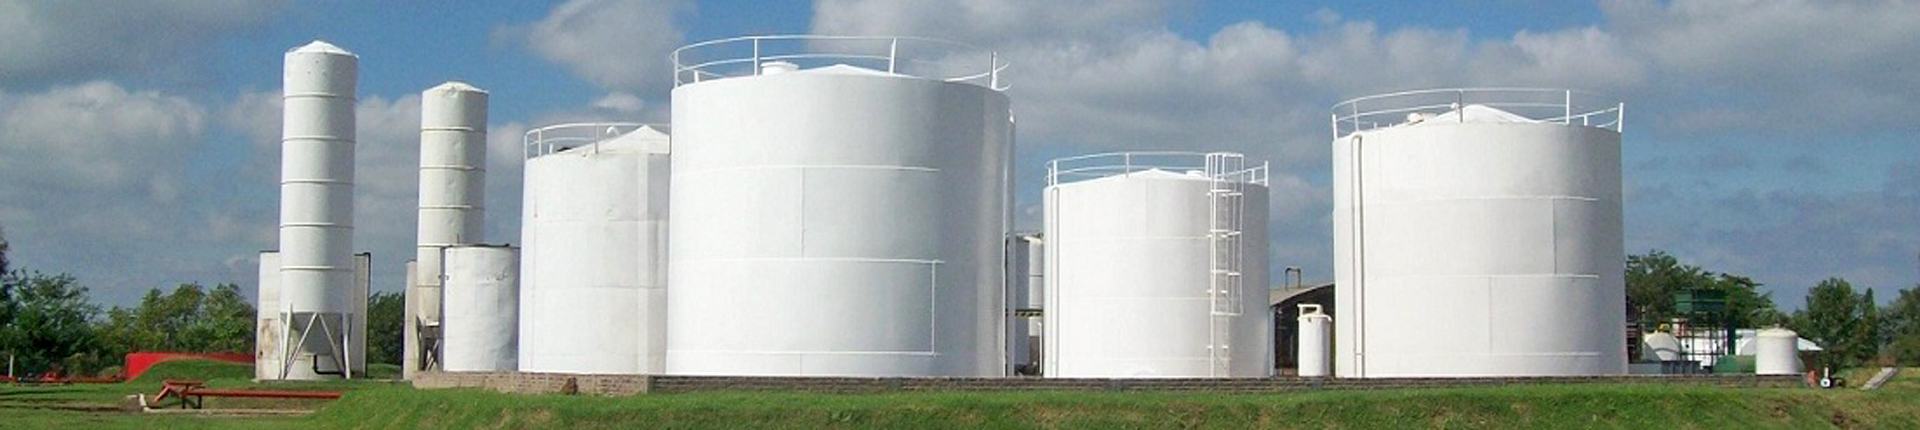 ambiental-campana-residuos-industriales-2